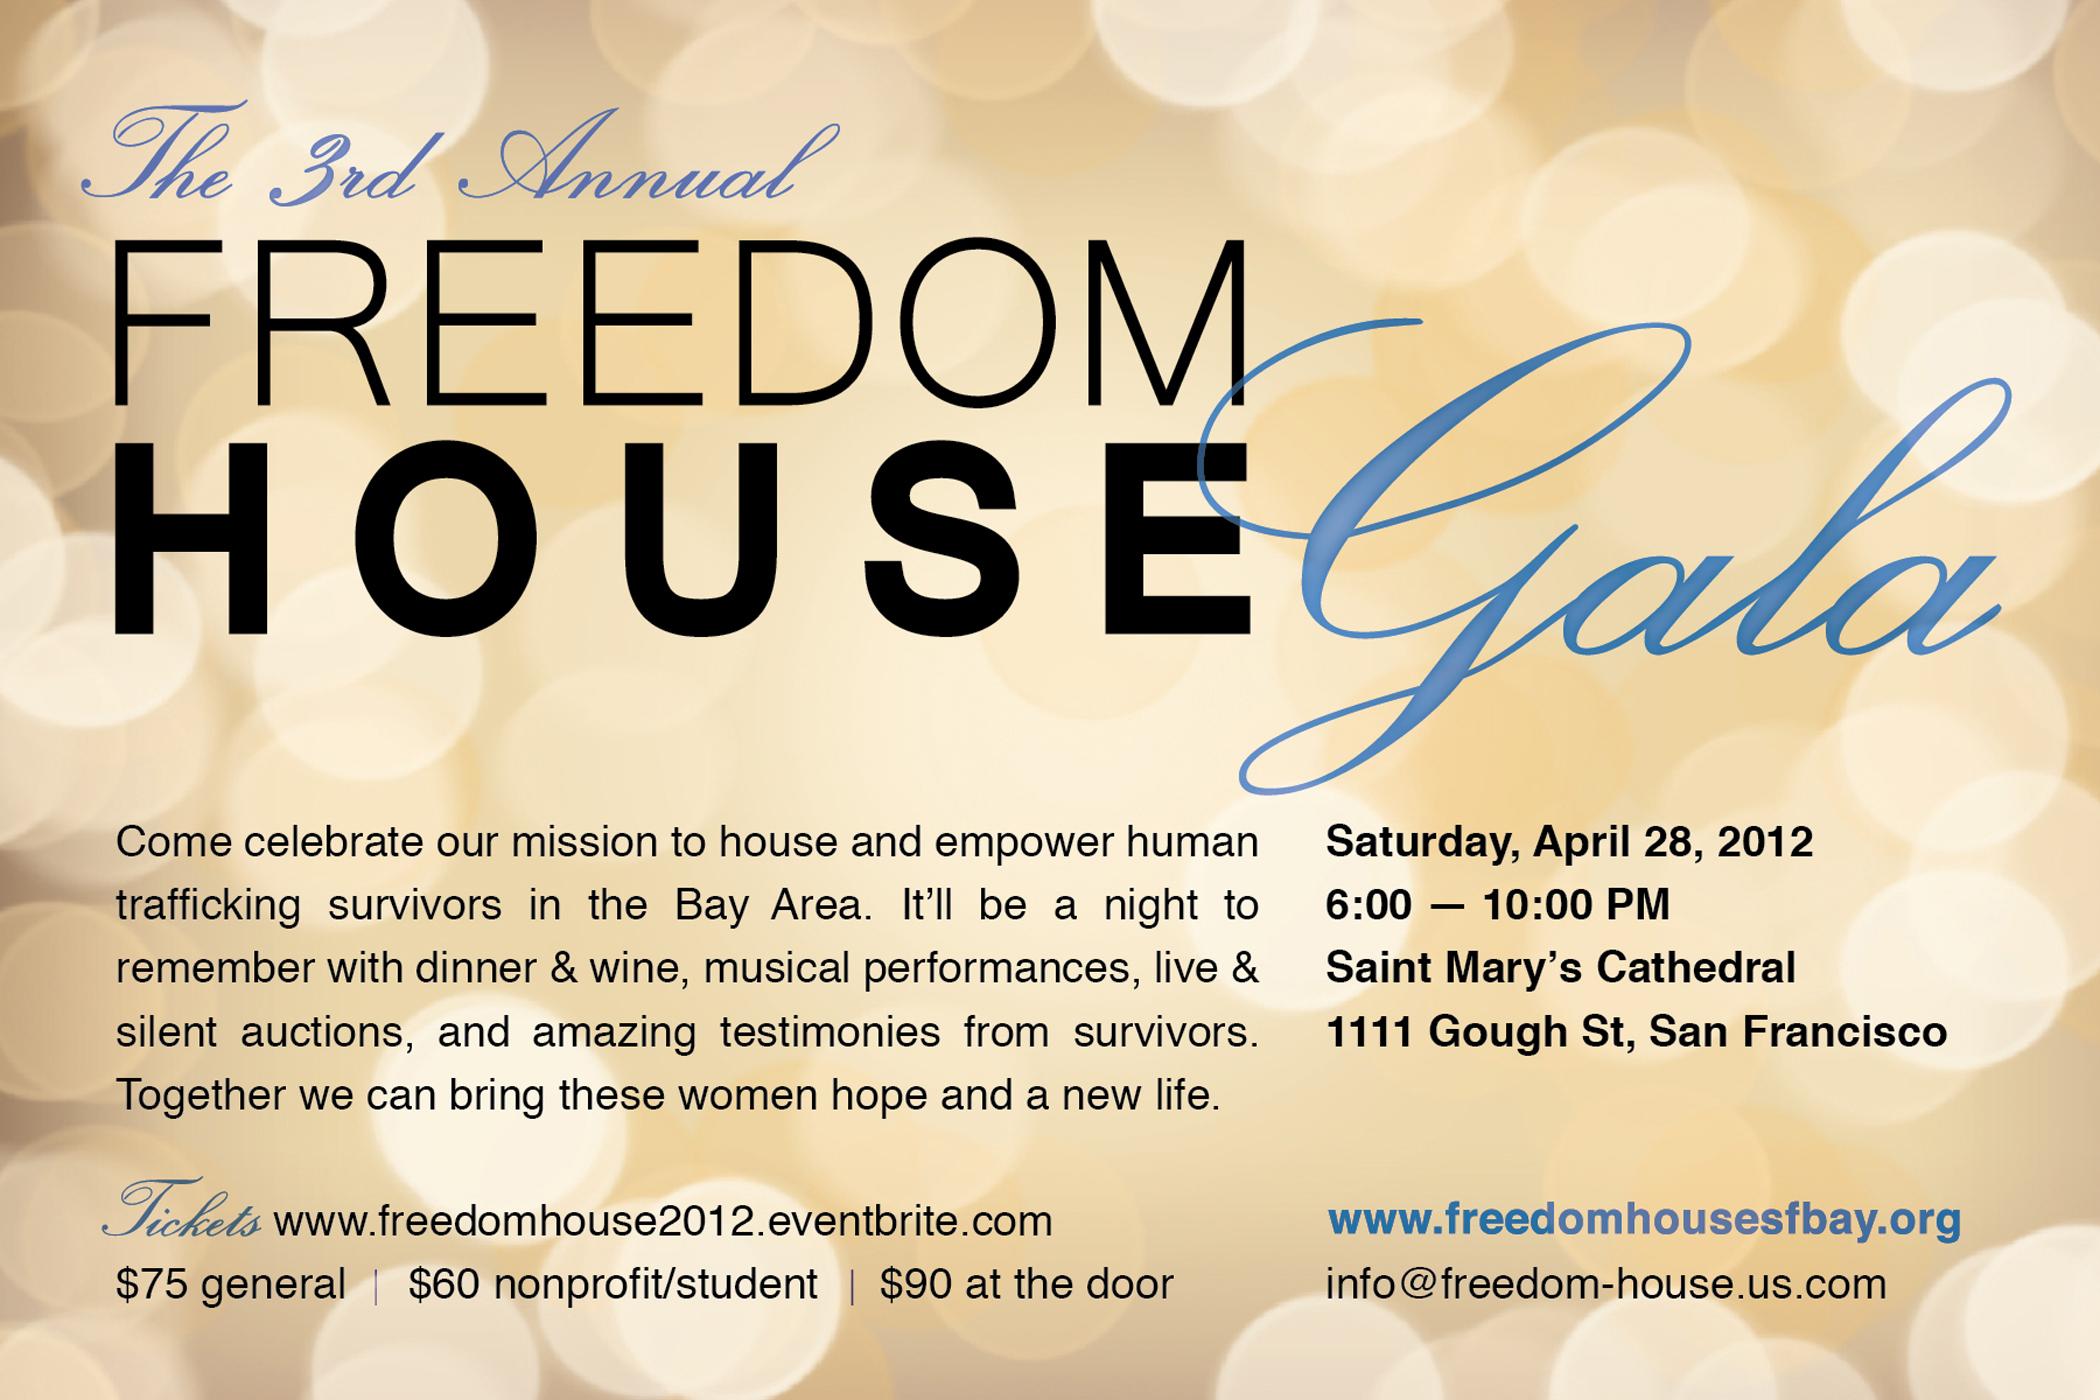 2012-04-19-FreedomHouseGalaTrafficking.jpg